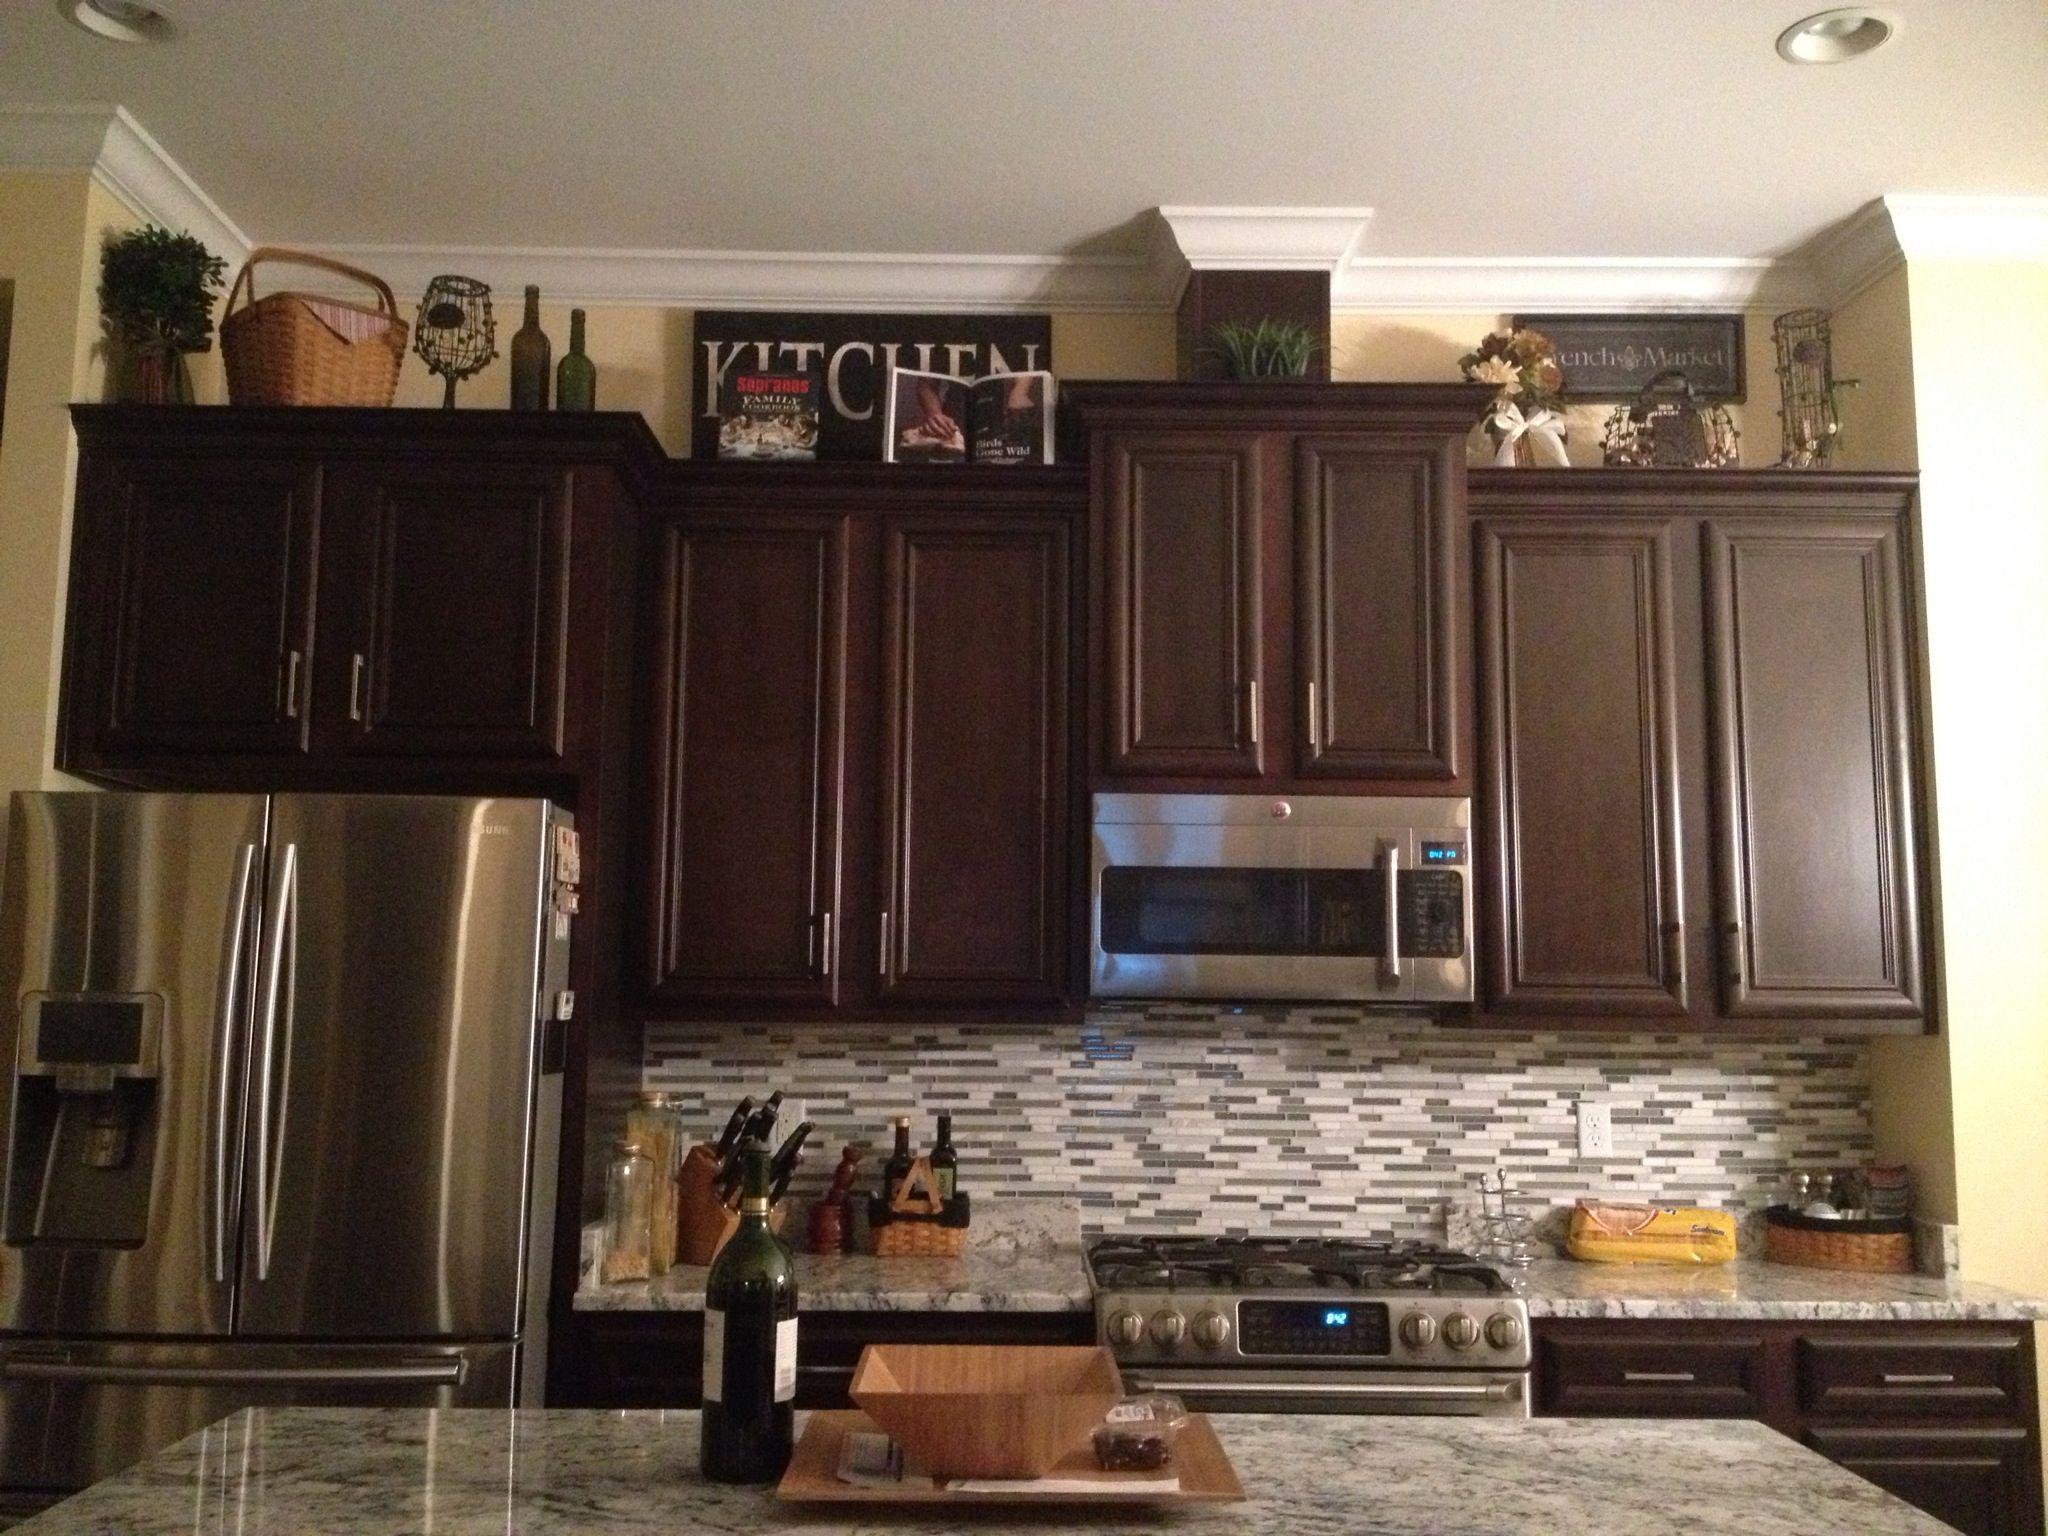 Pin By Lori Mann On Lori S Projects Kitchen Decor Kitchen Cabinets Decor Decorating Above Kitchen Cabinets